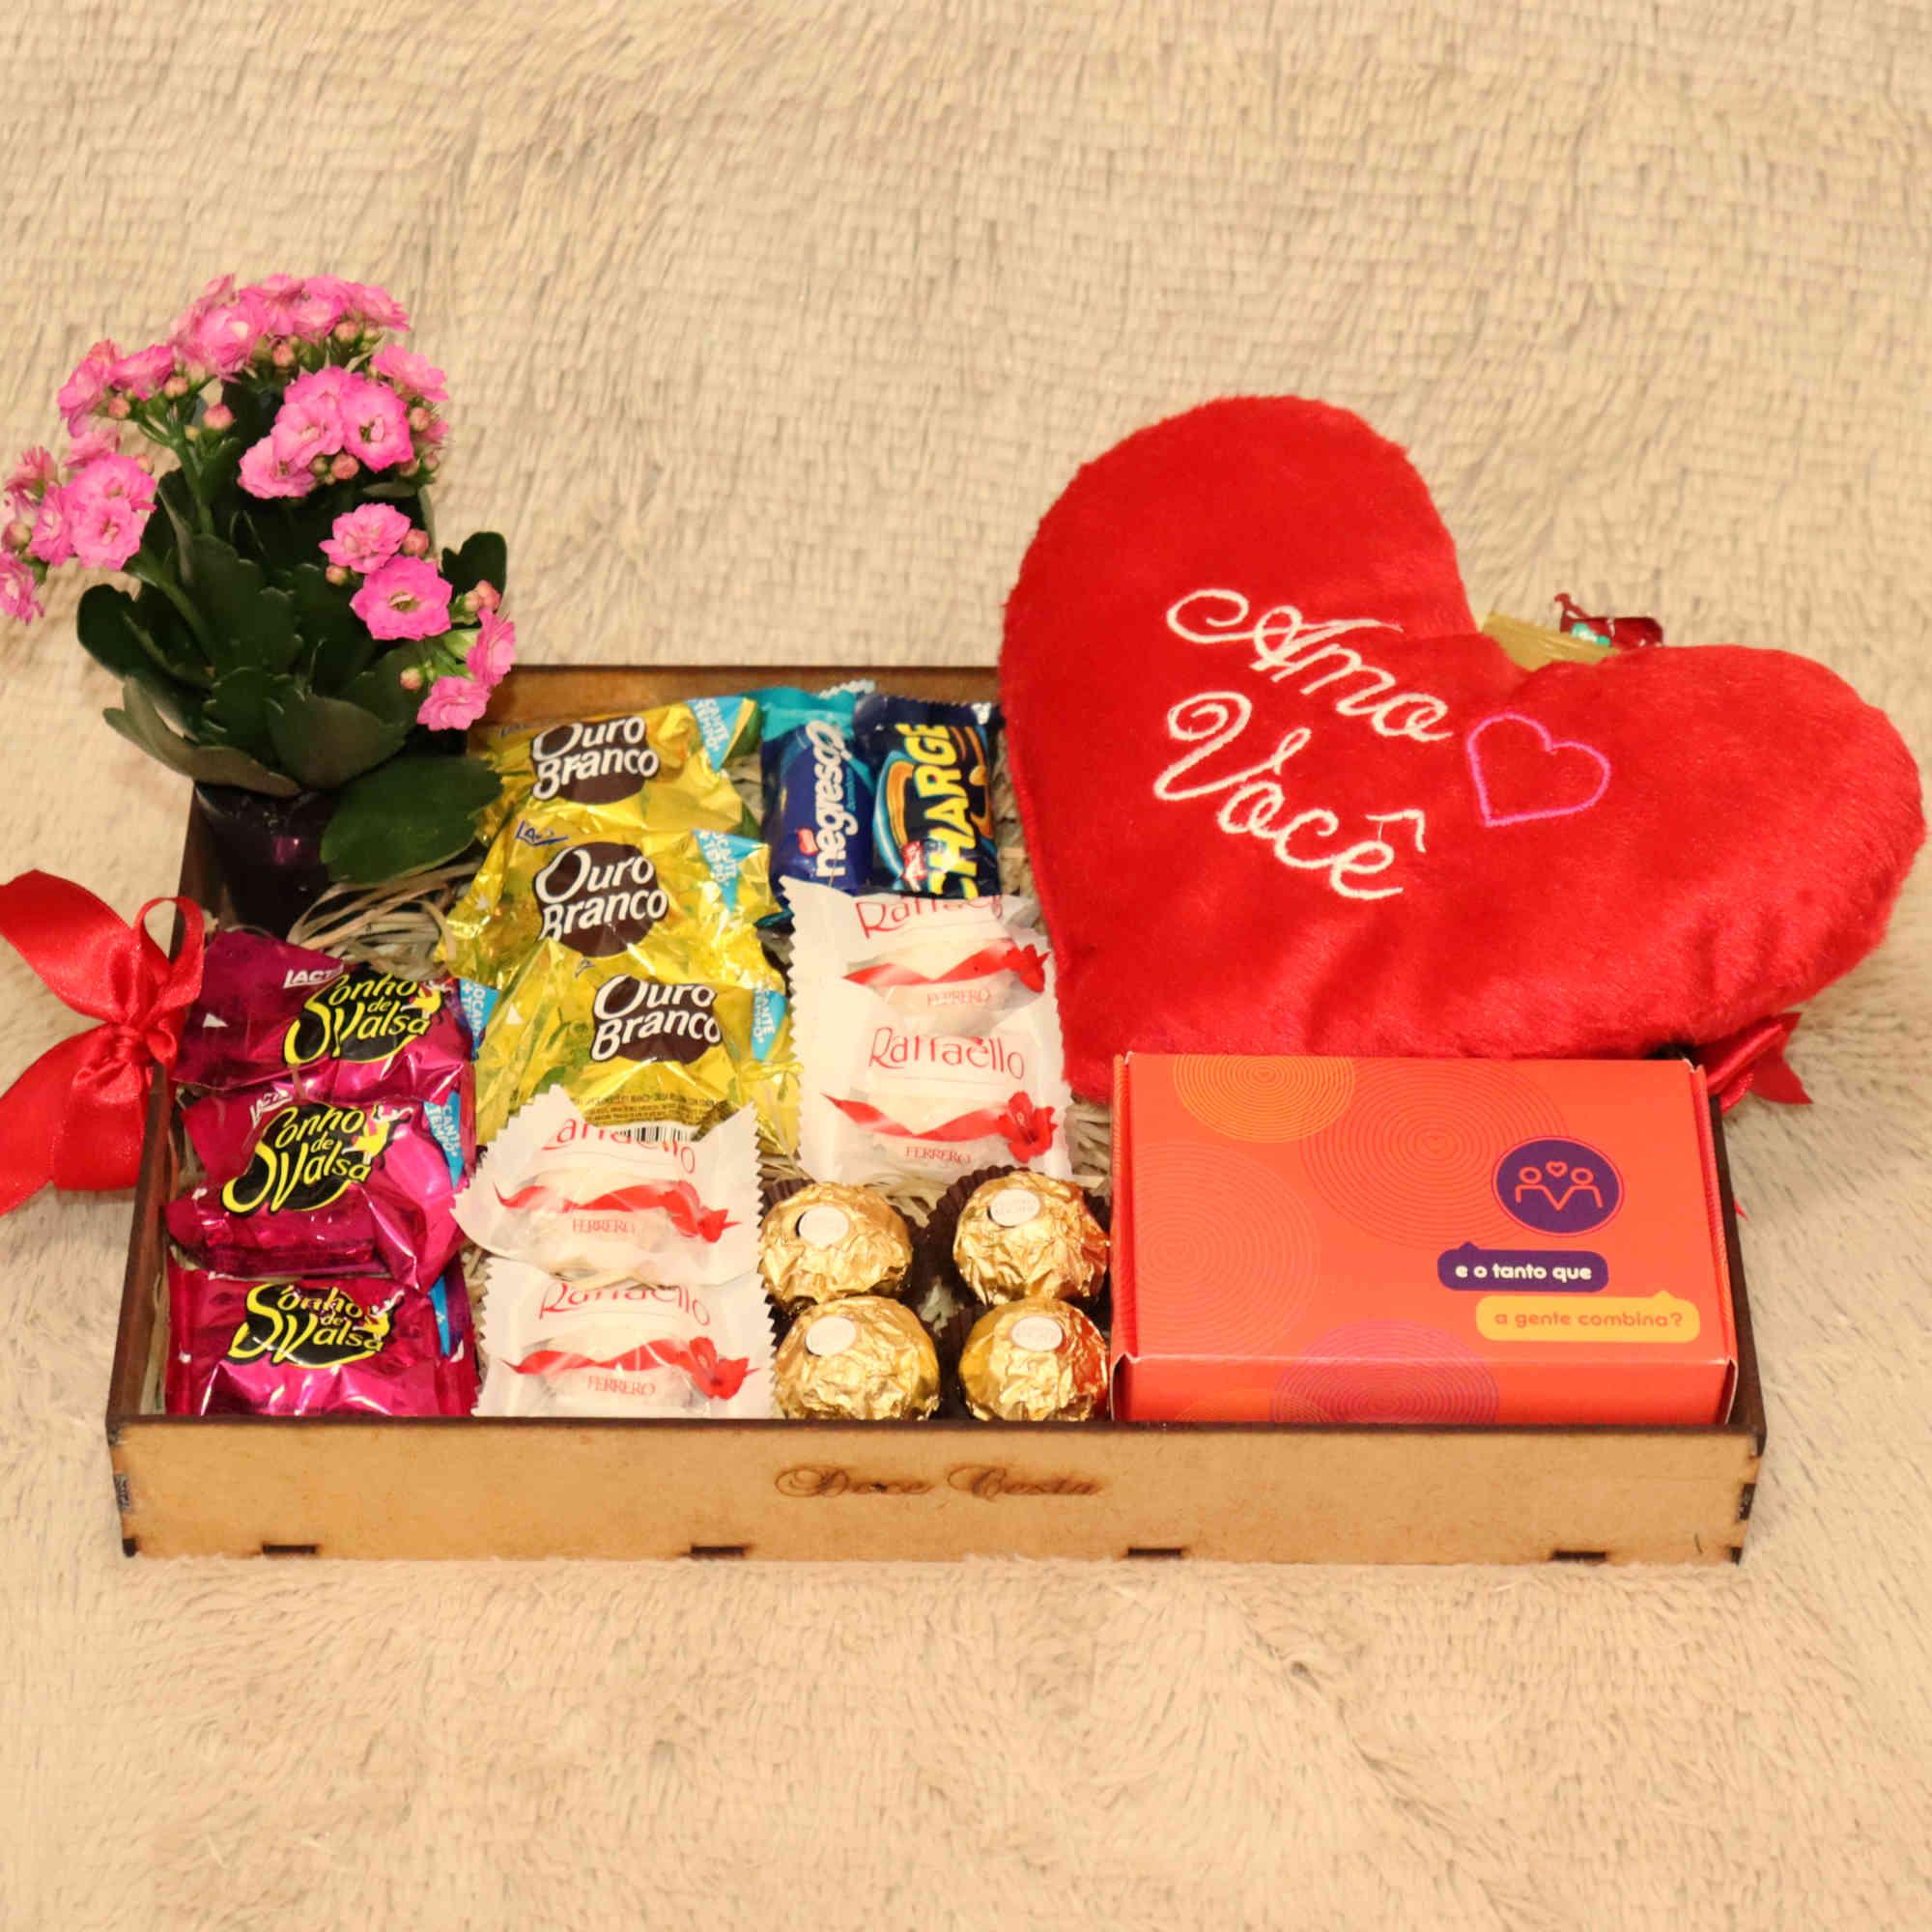 Bandeja Romântica com Pelúcia, Ferrero Rocher e Chocolates